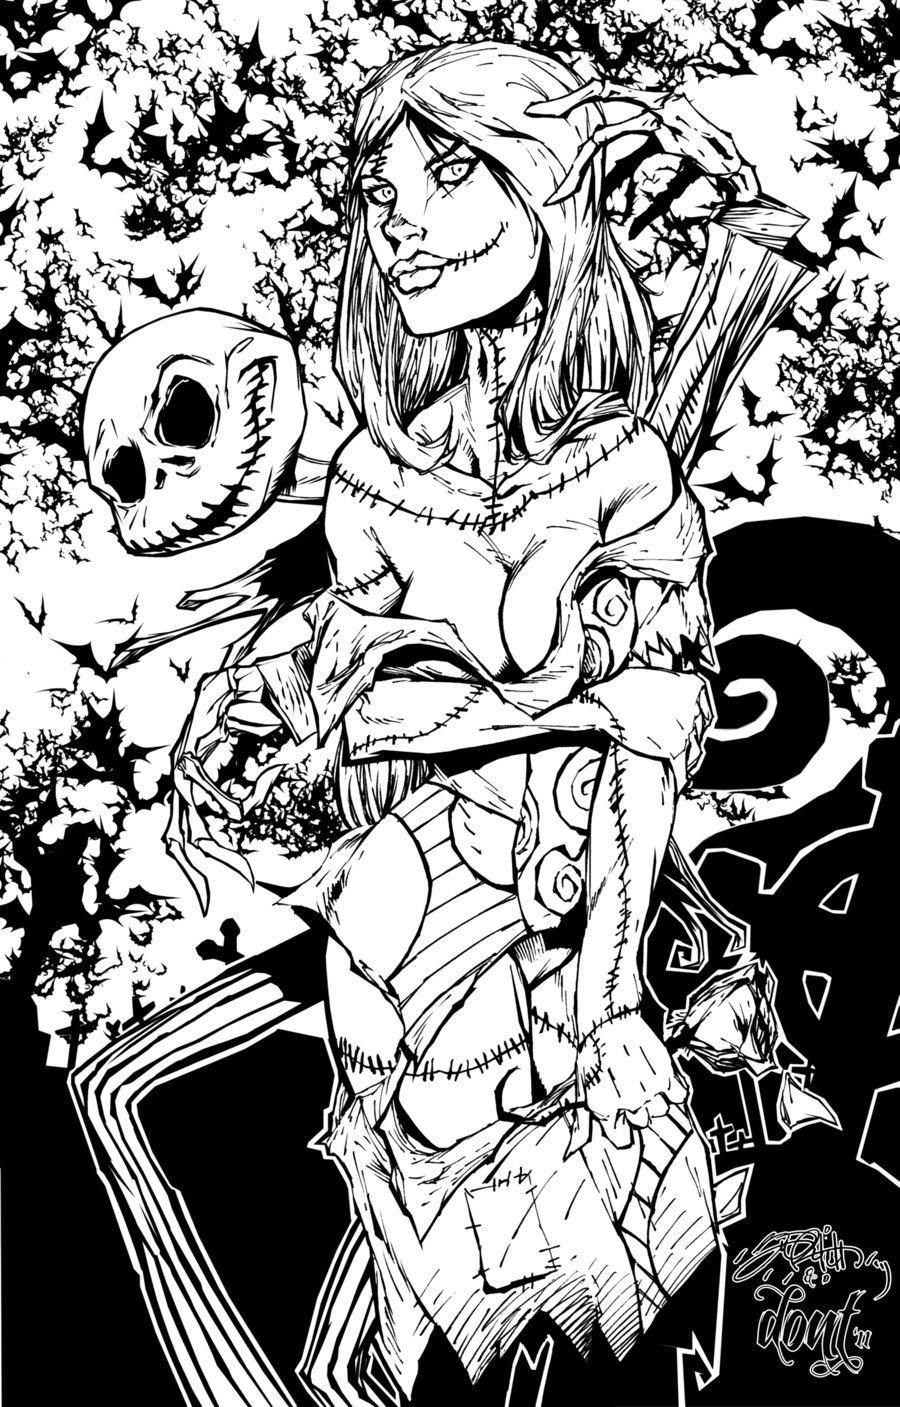 900x1407 Pics Of Sally Creepypasta Coloring Pages Jack Skellington